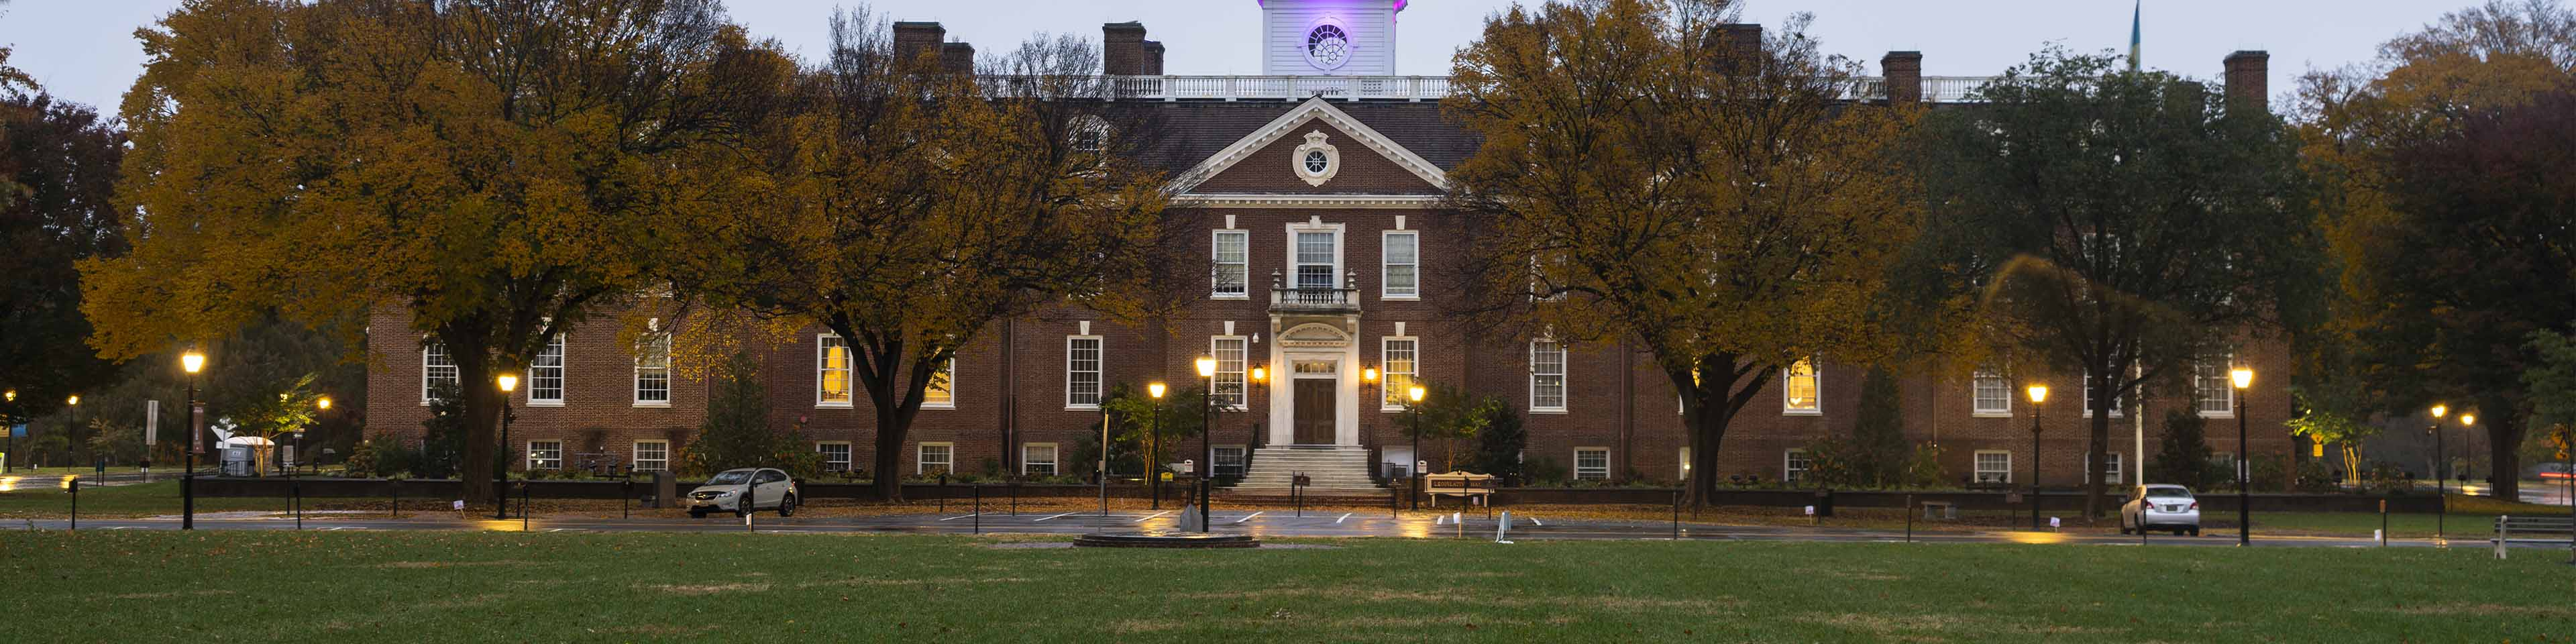 Delaware entity law 2021 compliance checklist